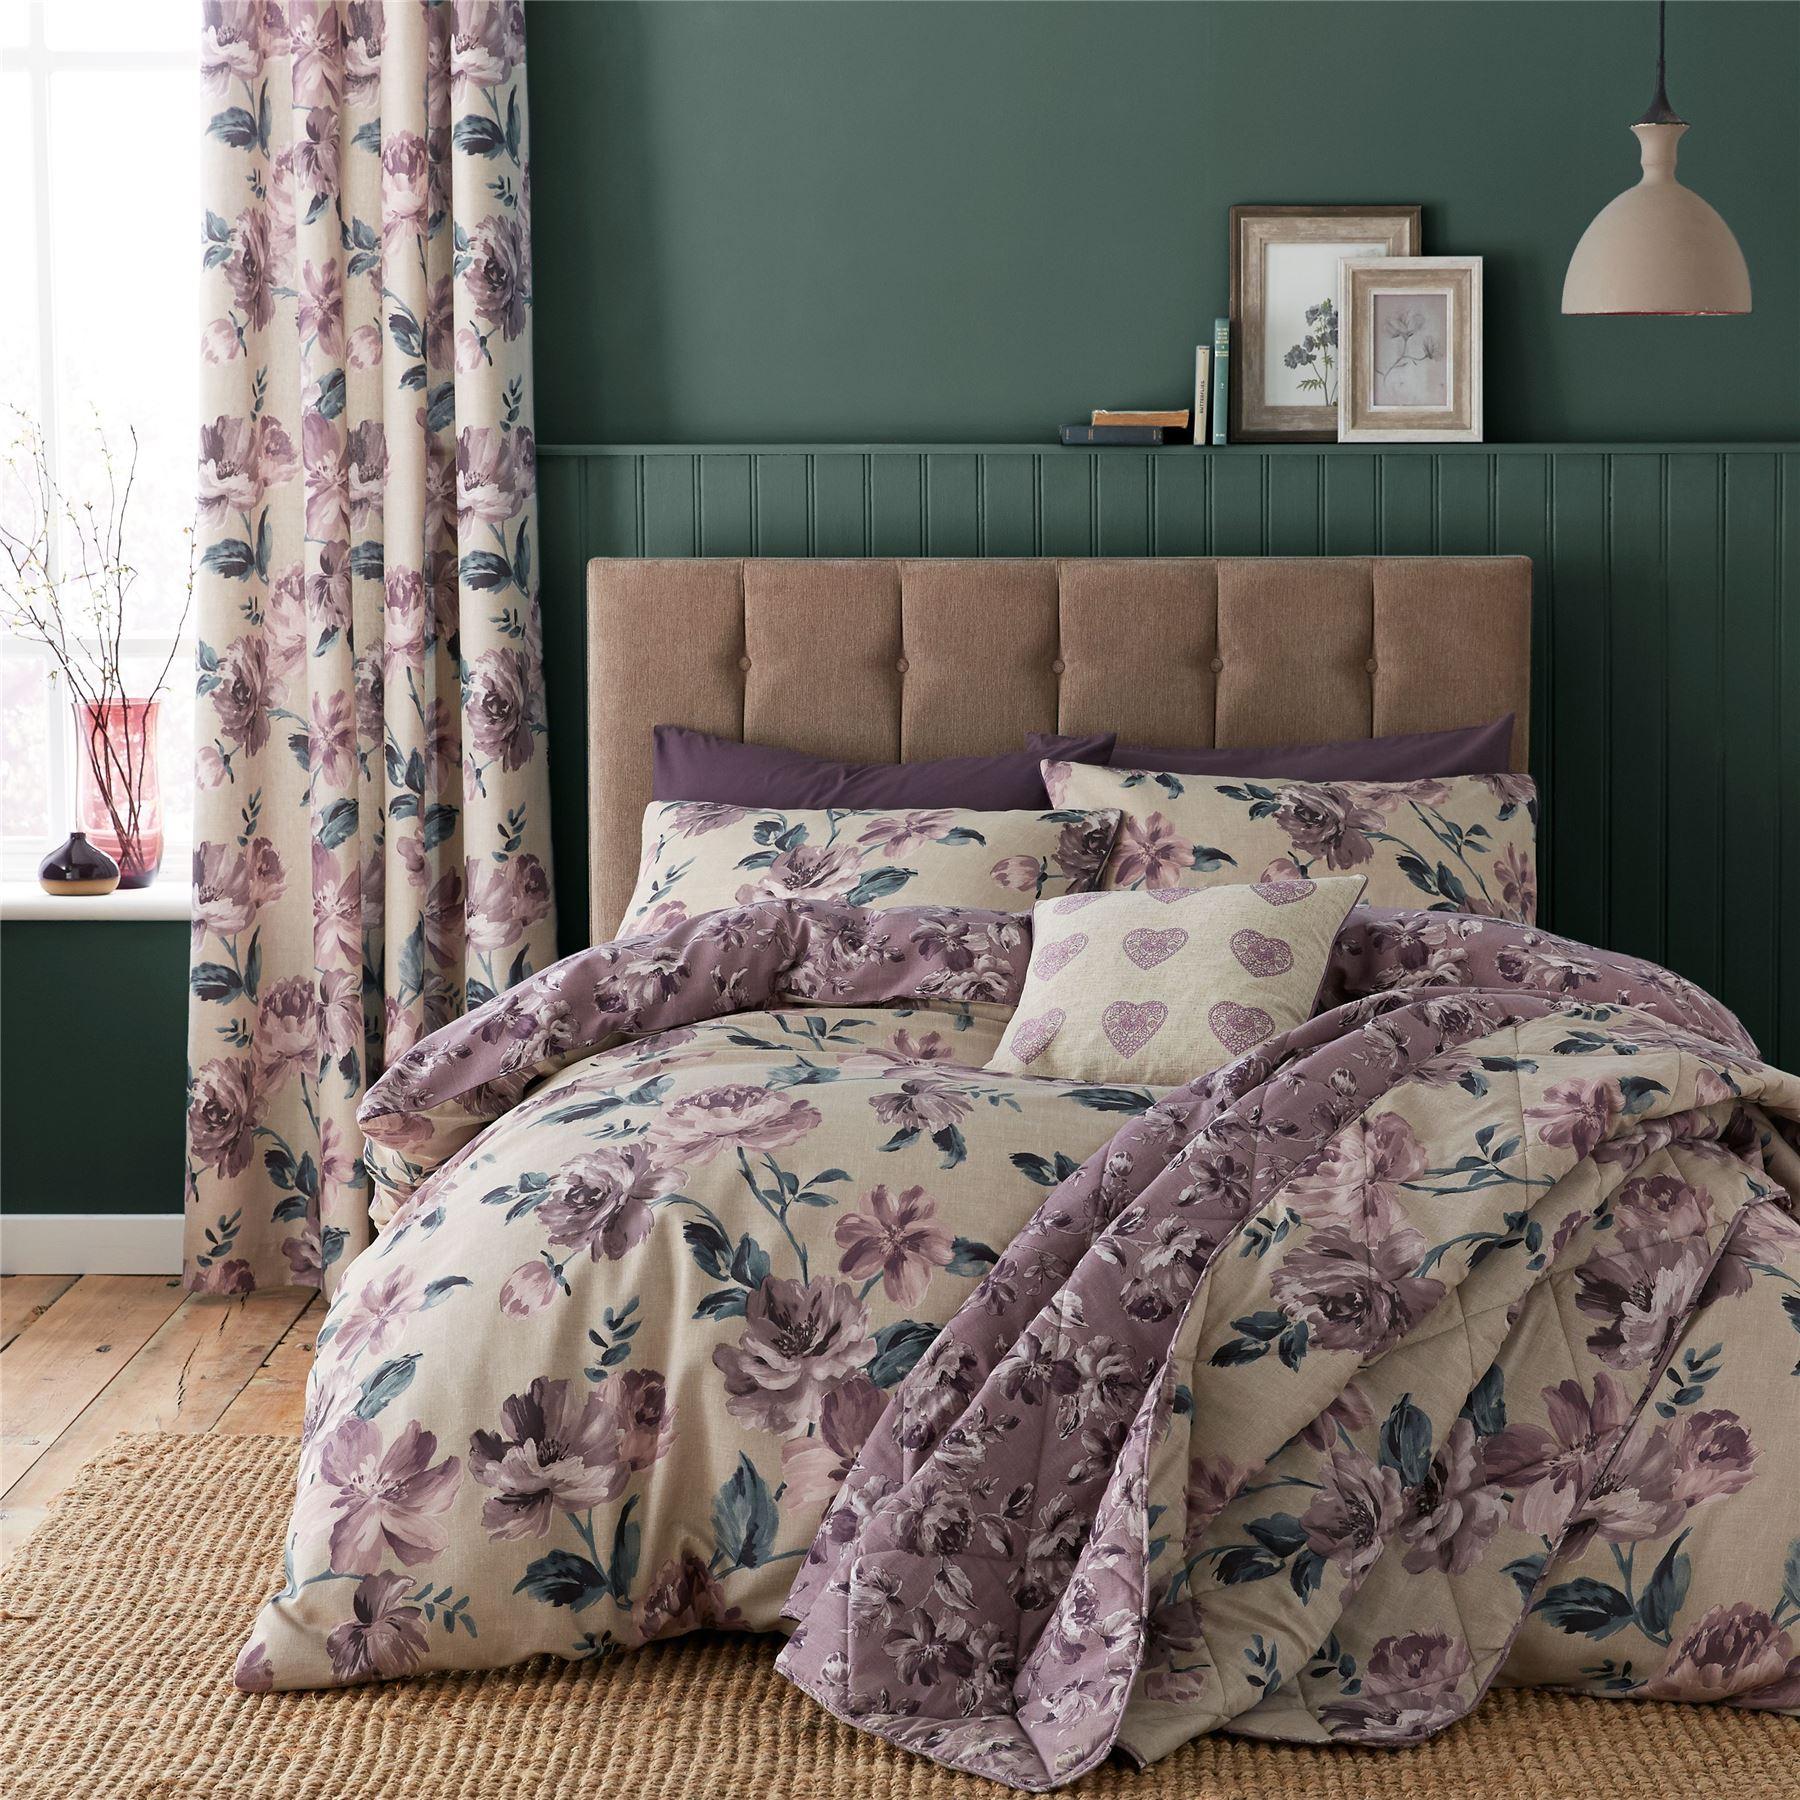 Painted Floral Duvet Quilt Cover Set, Bed Linen Double King Size ... : double size quilt - Adamdwight.com